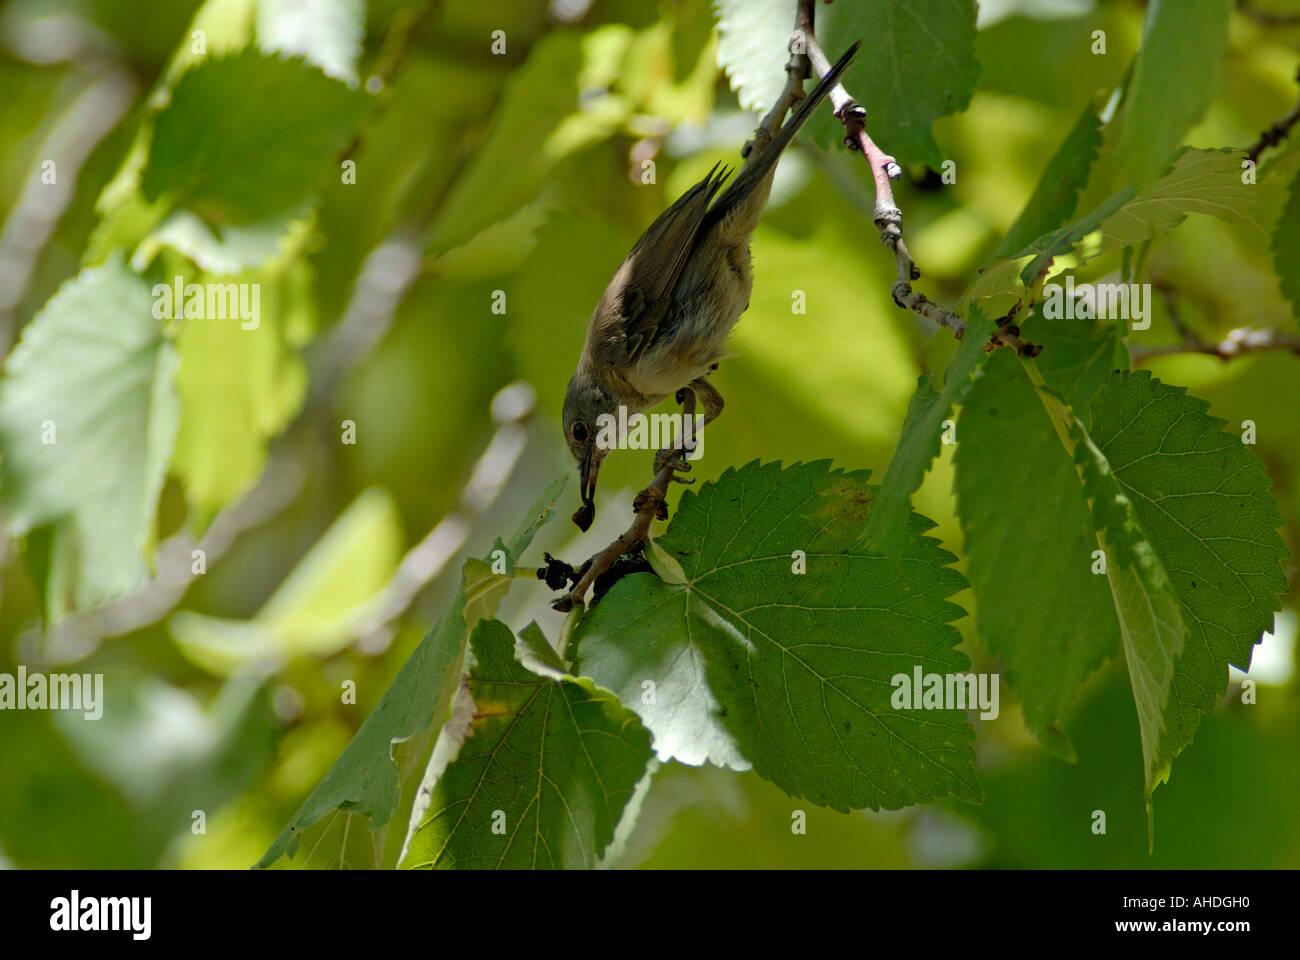 Passerine feeding on berries in shady part of tree - Stock Image